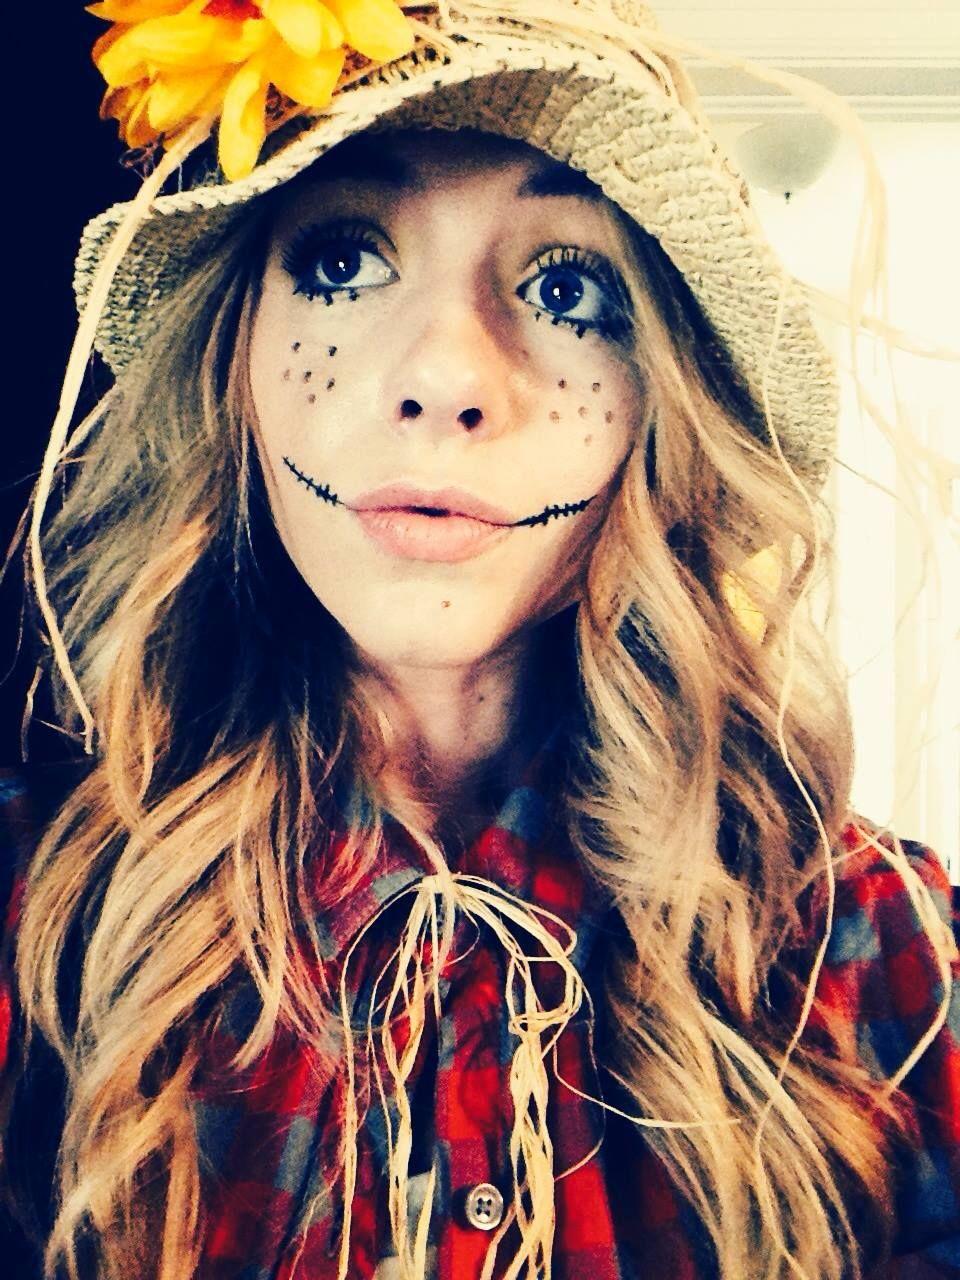 cute scarecrow costume source instagram user vivalatails